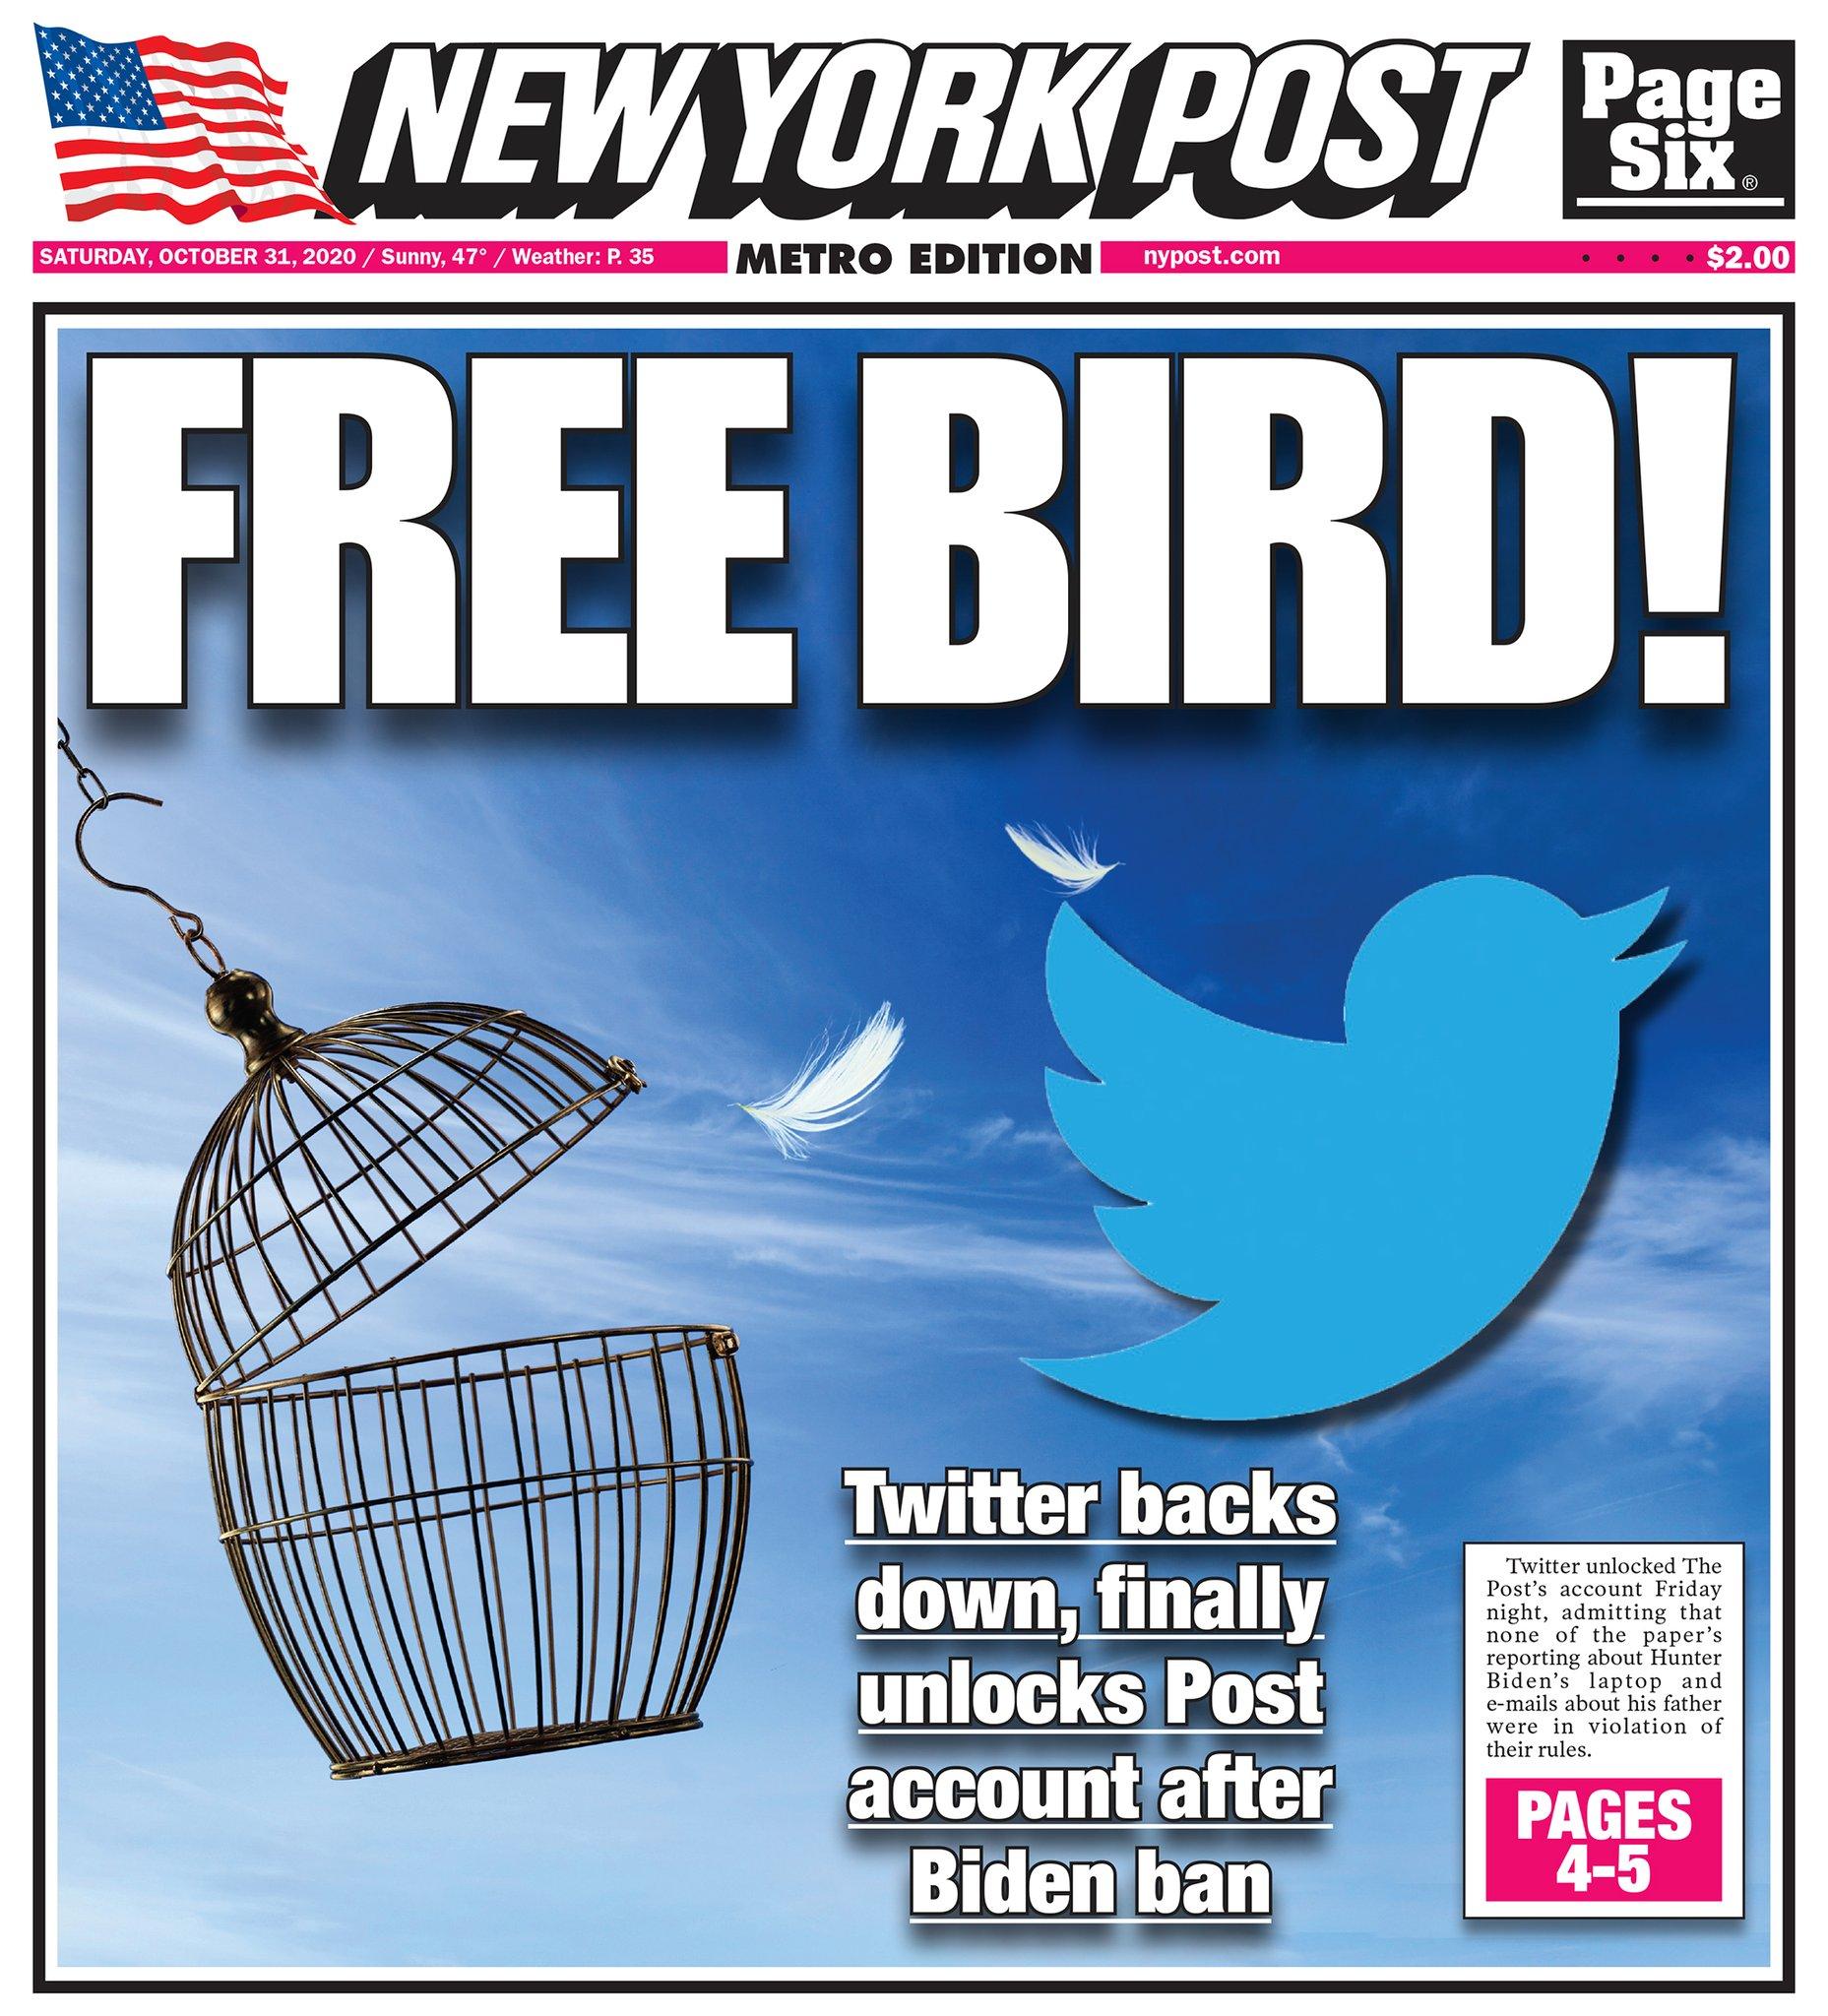 New York Post on Twitter